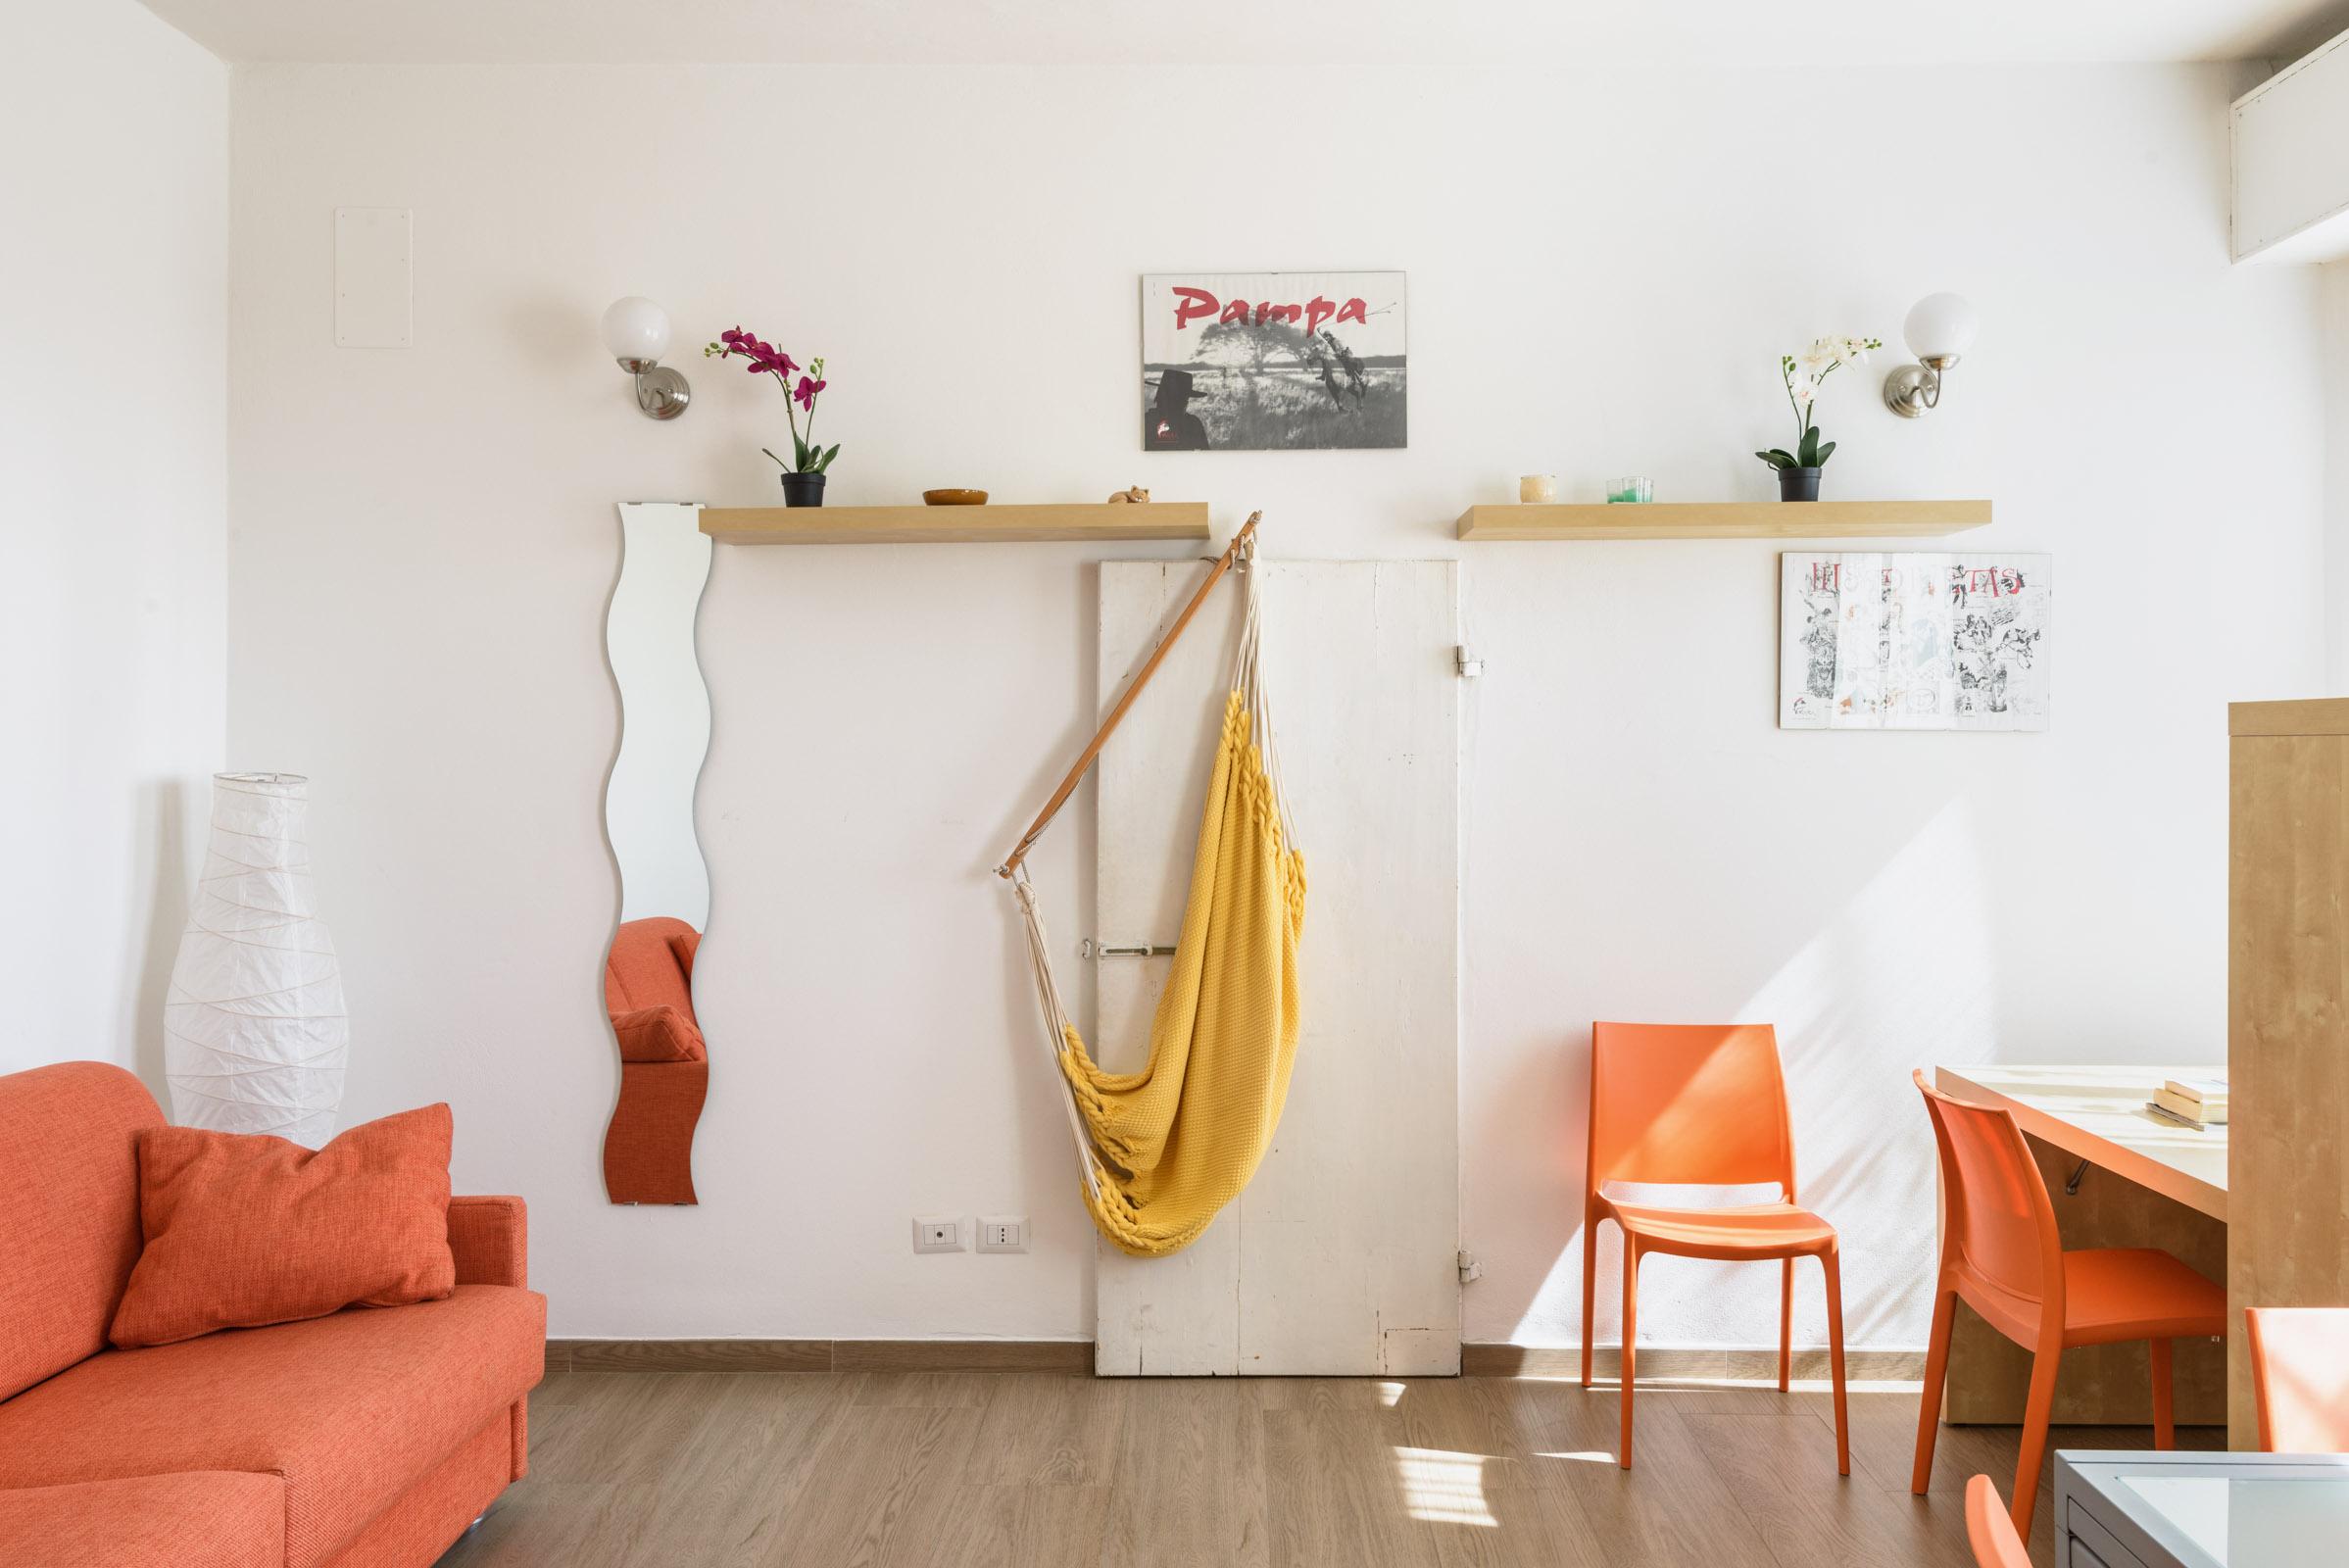 appartamento_portannesebbweb-029